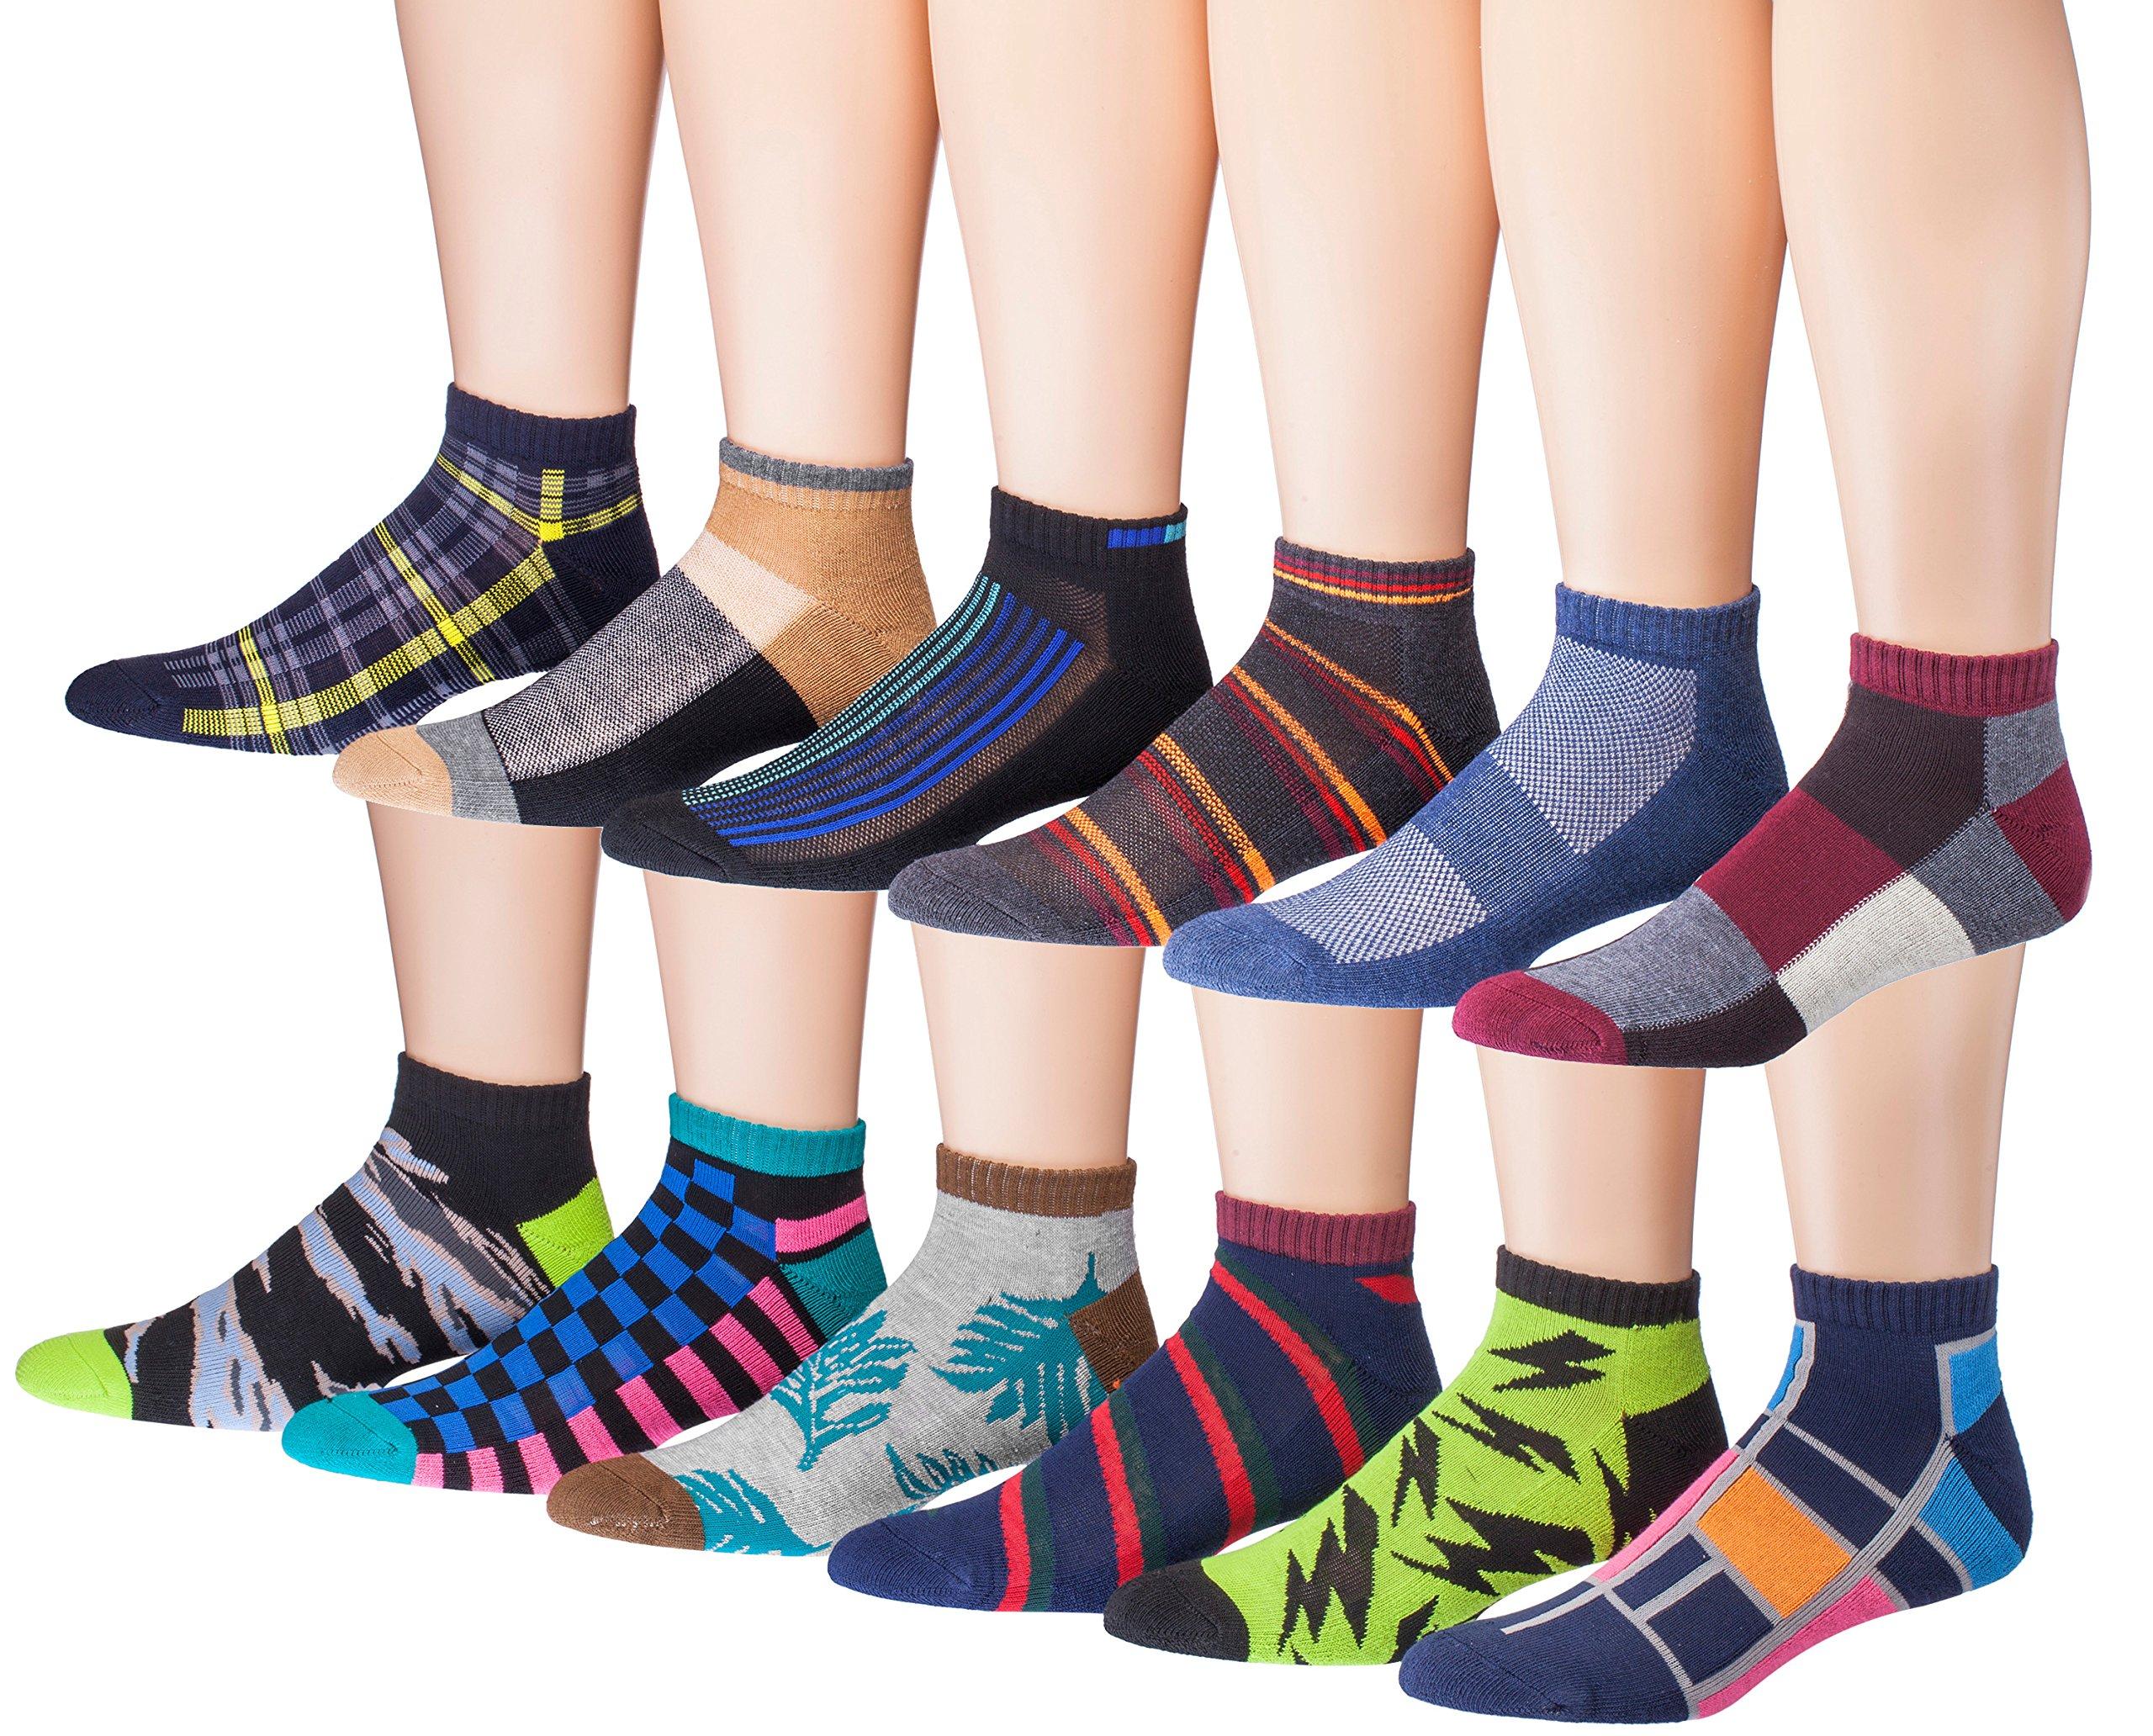 James Fiallo Men's 12-Pairs Low Cut Athletic Sport Peformance Socks, (sock size 10-13) Fits shoe size 6-12, 2903-04